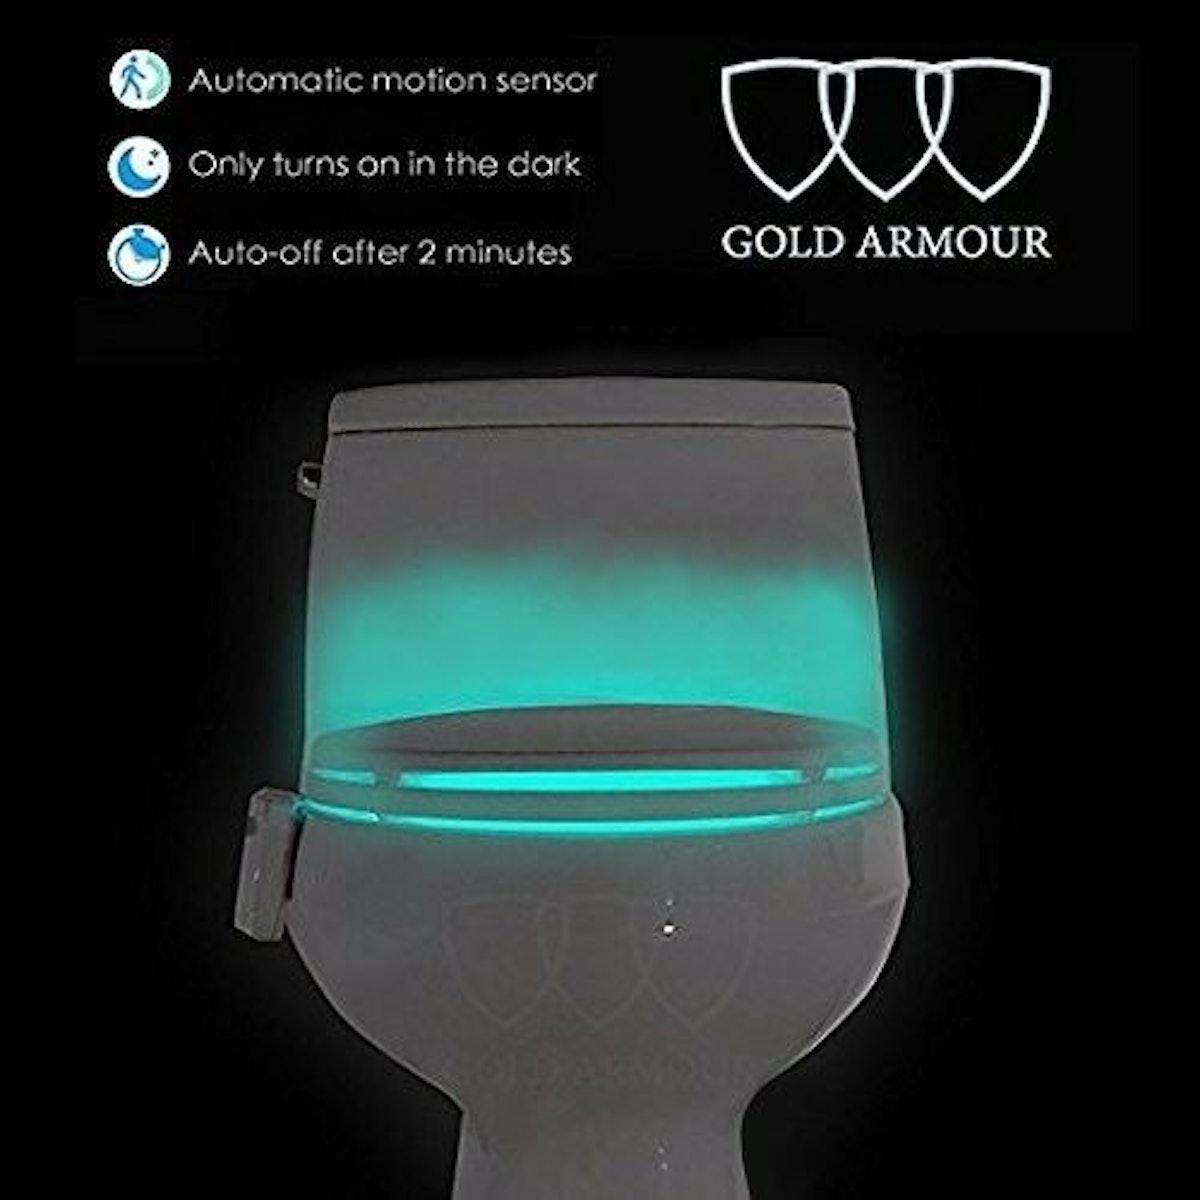 Gold Armour Toilet Night Light